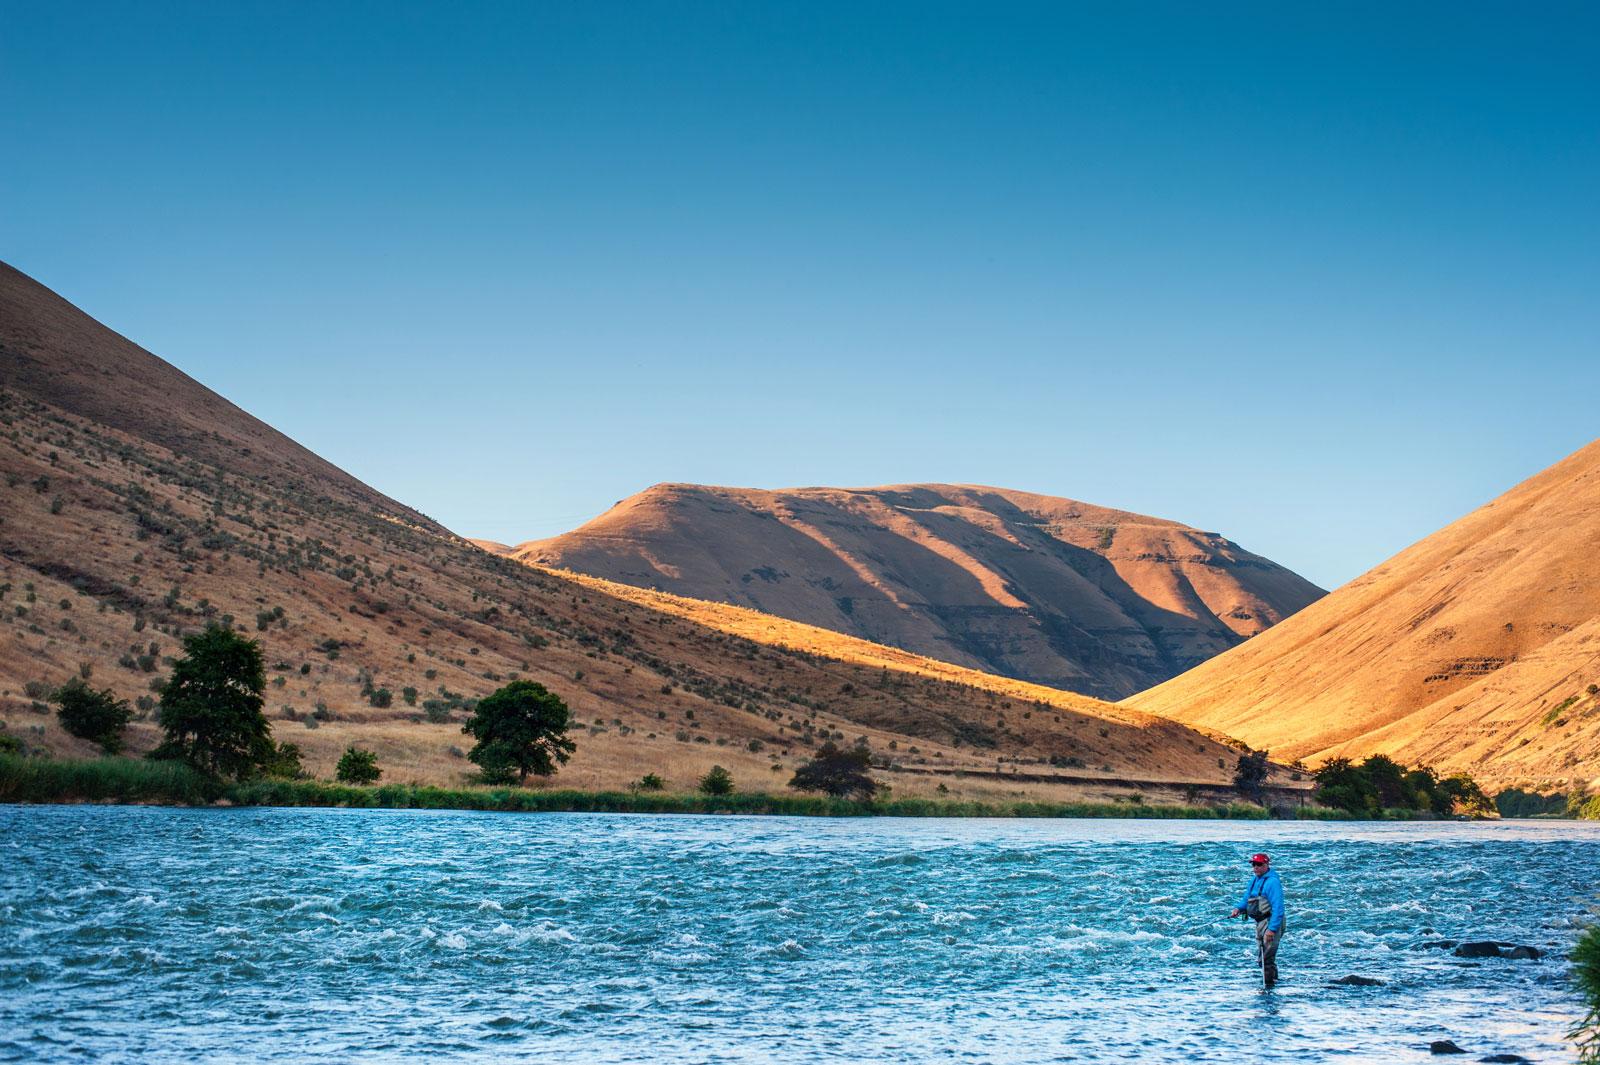 Deschutes River Fly fishing Camp Trips | Renton's River